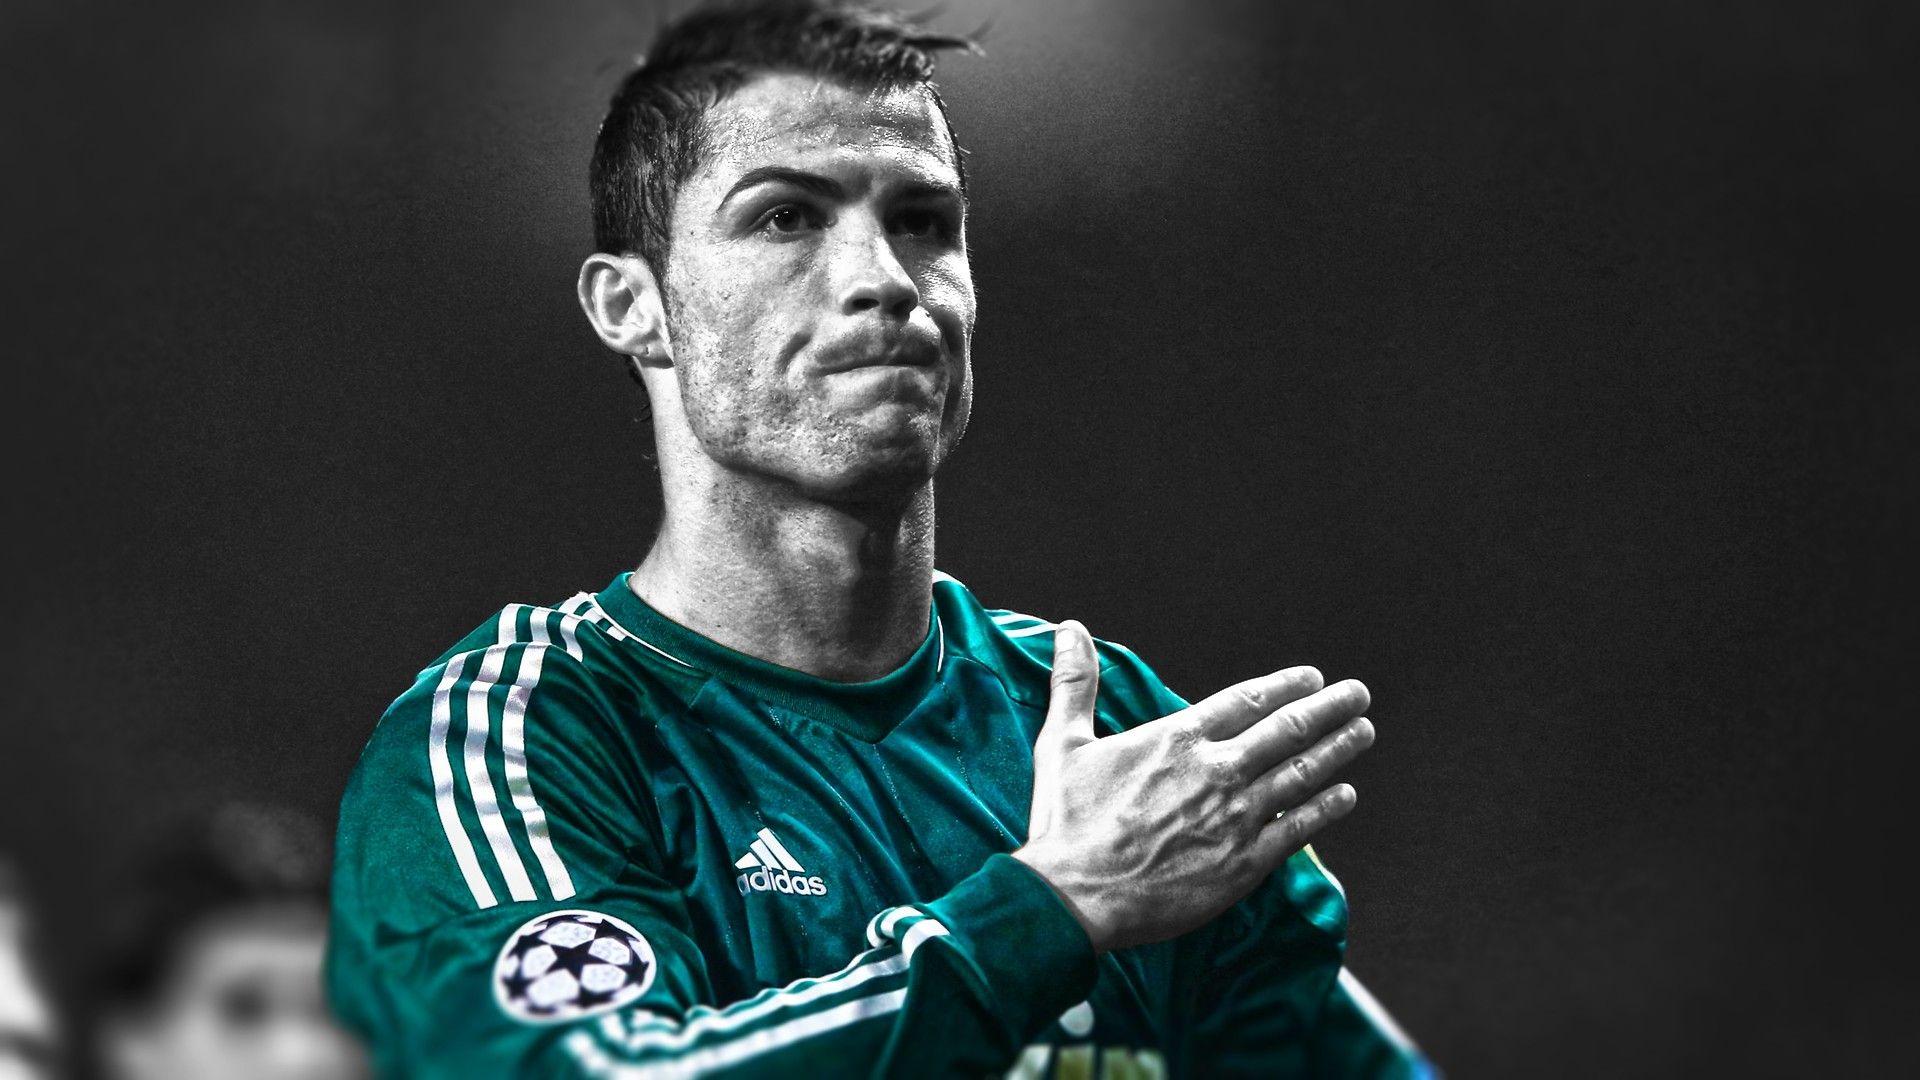 C Ronaldo Black And White Wallpaper Real Madrid Cristiano Ronaldo Quotes Cristiano Ronaldo Hd Wallpapers Cristiano Ronaldo Wallpapers